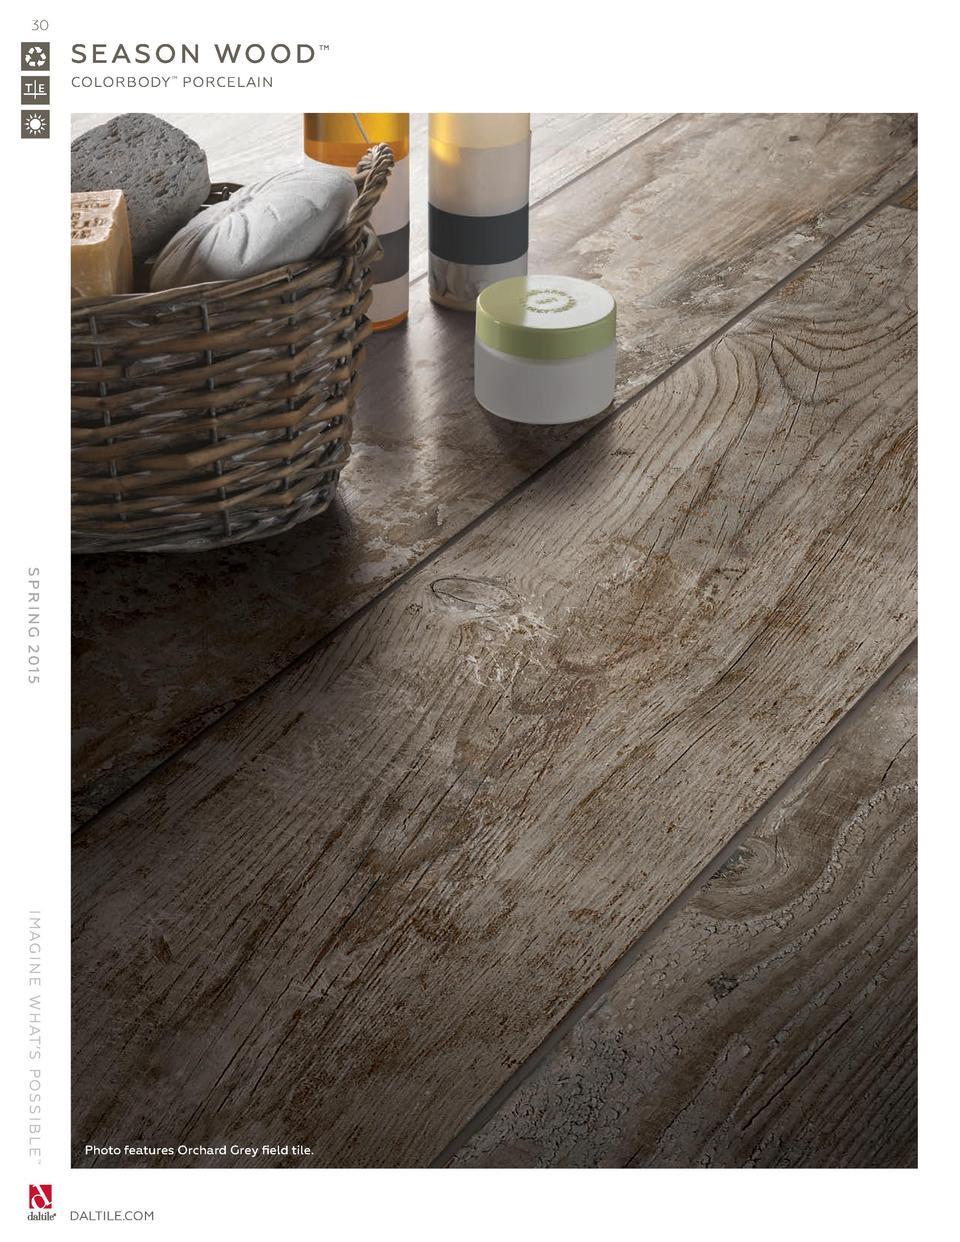 Reclaimed Hardwood Flooring St Louis Of Daltile Spring 2015 Catalog Simplebooklet Com Intended for 30 S E A S O N Wo O D Colorbody Porcelain S P R I N G 2 01 5 I Mag I N E W Hat S Po